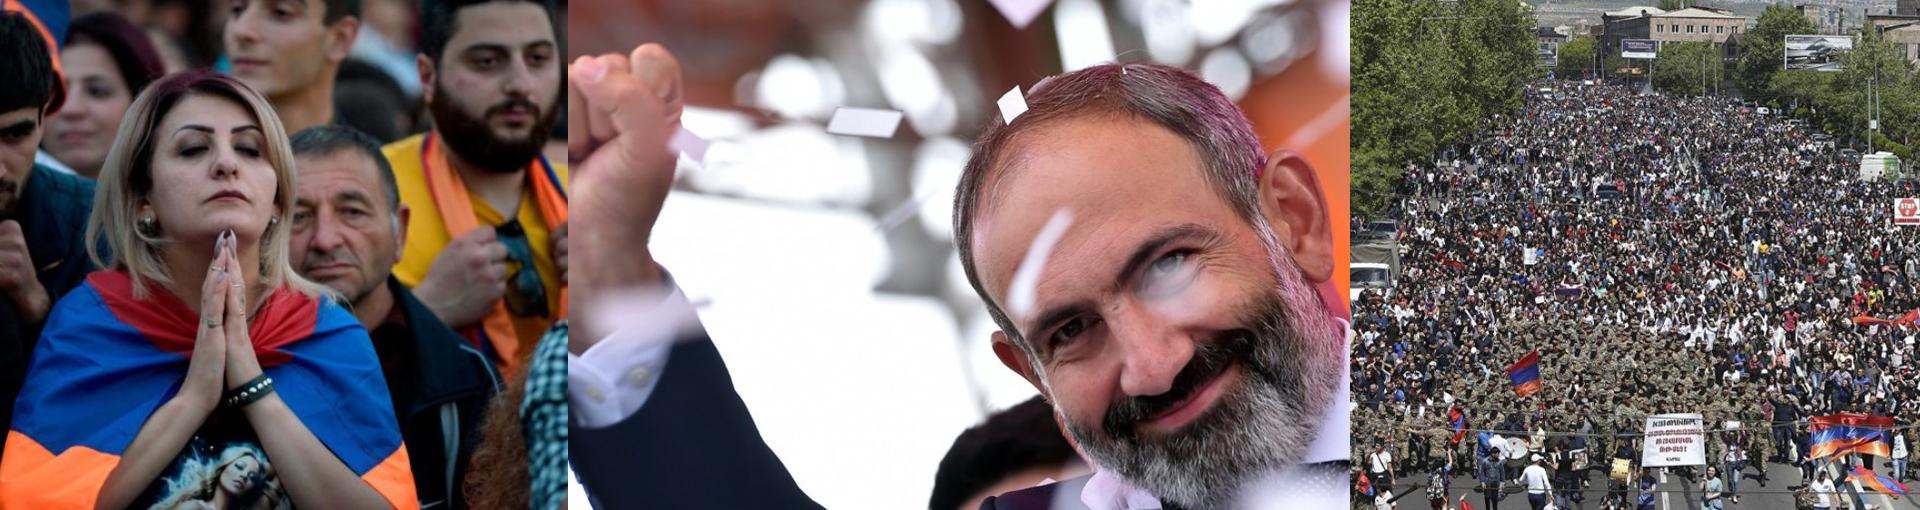 Armenia's Velvet Revolution:  Symbols and Memorable moments